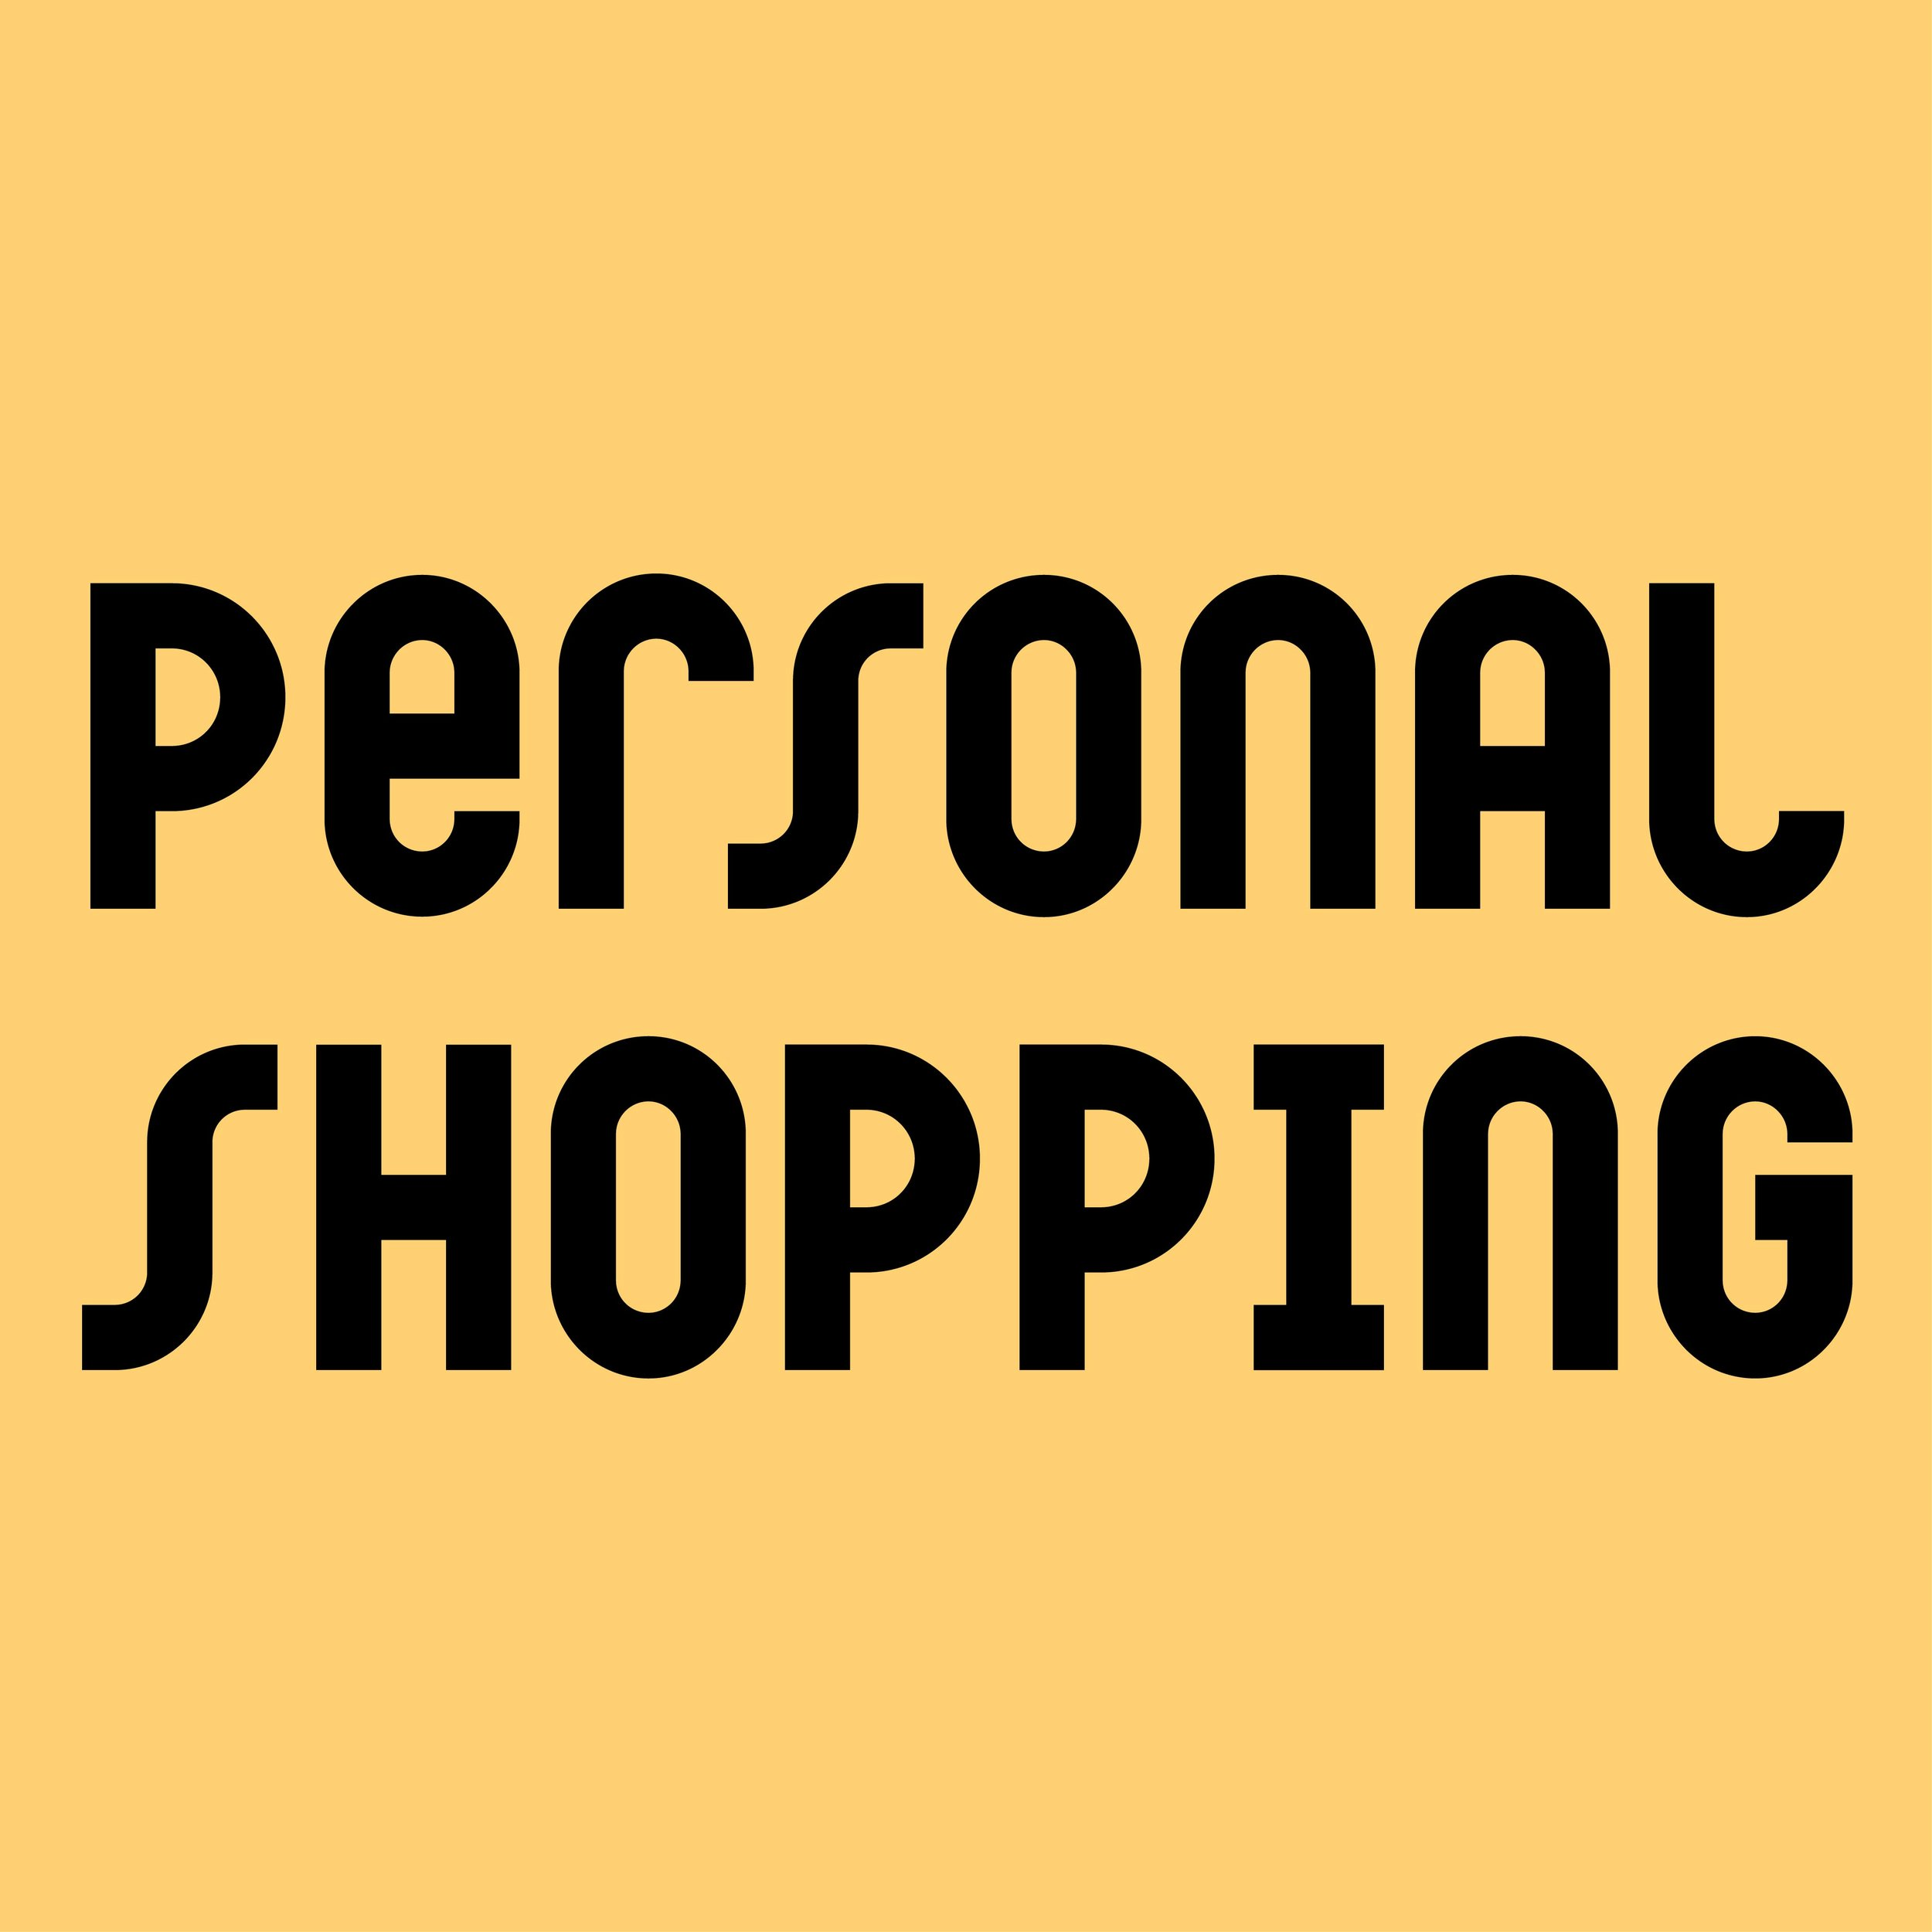 Personal Shopping.jpg